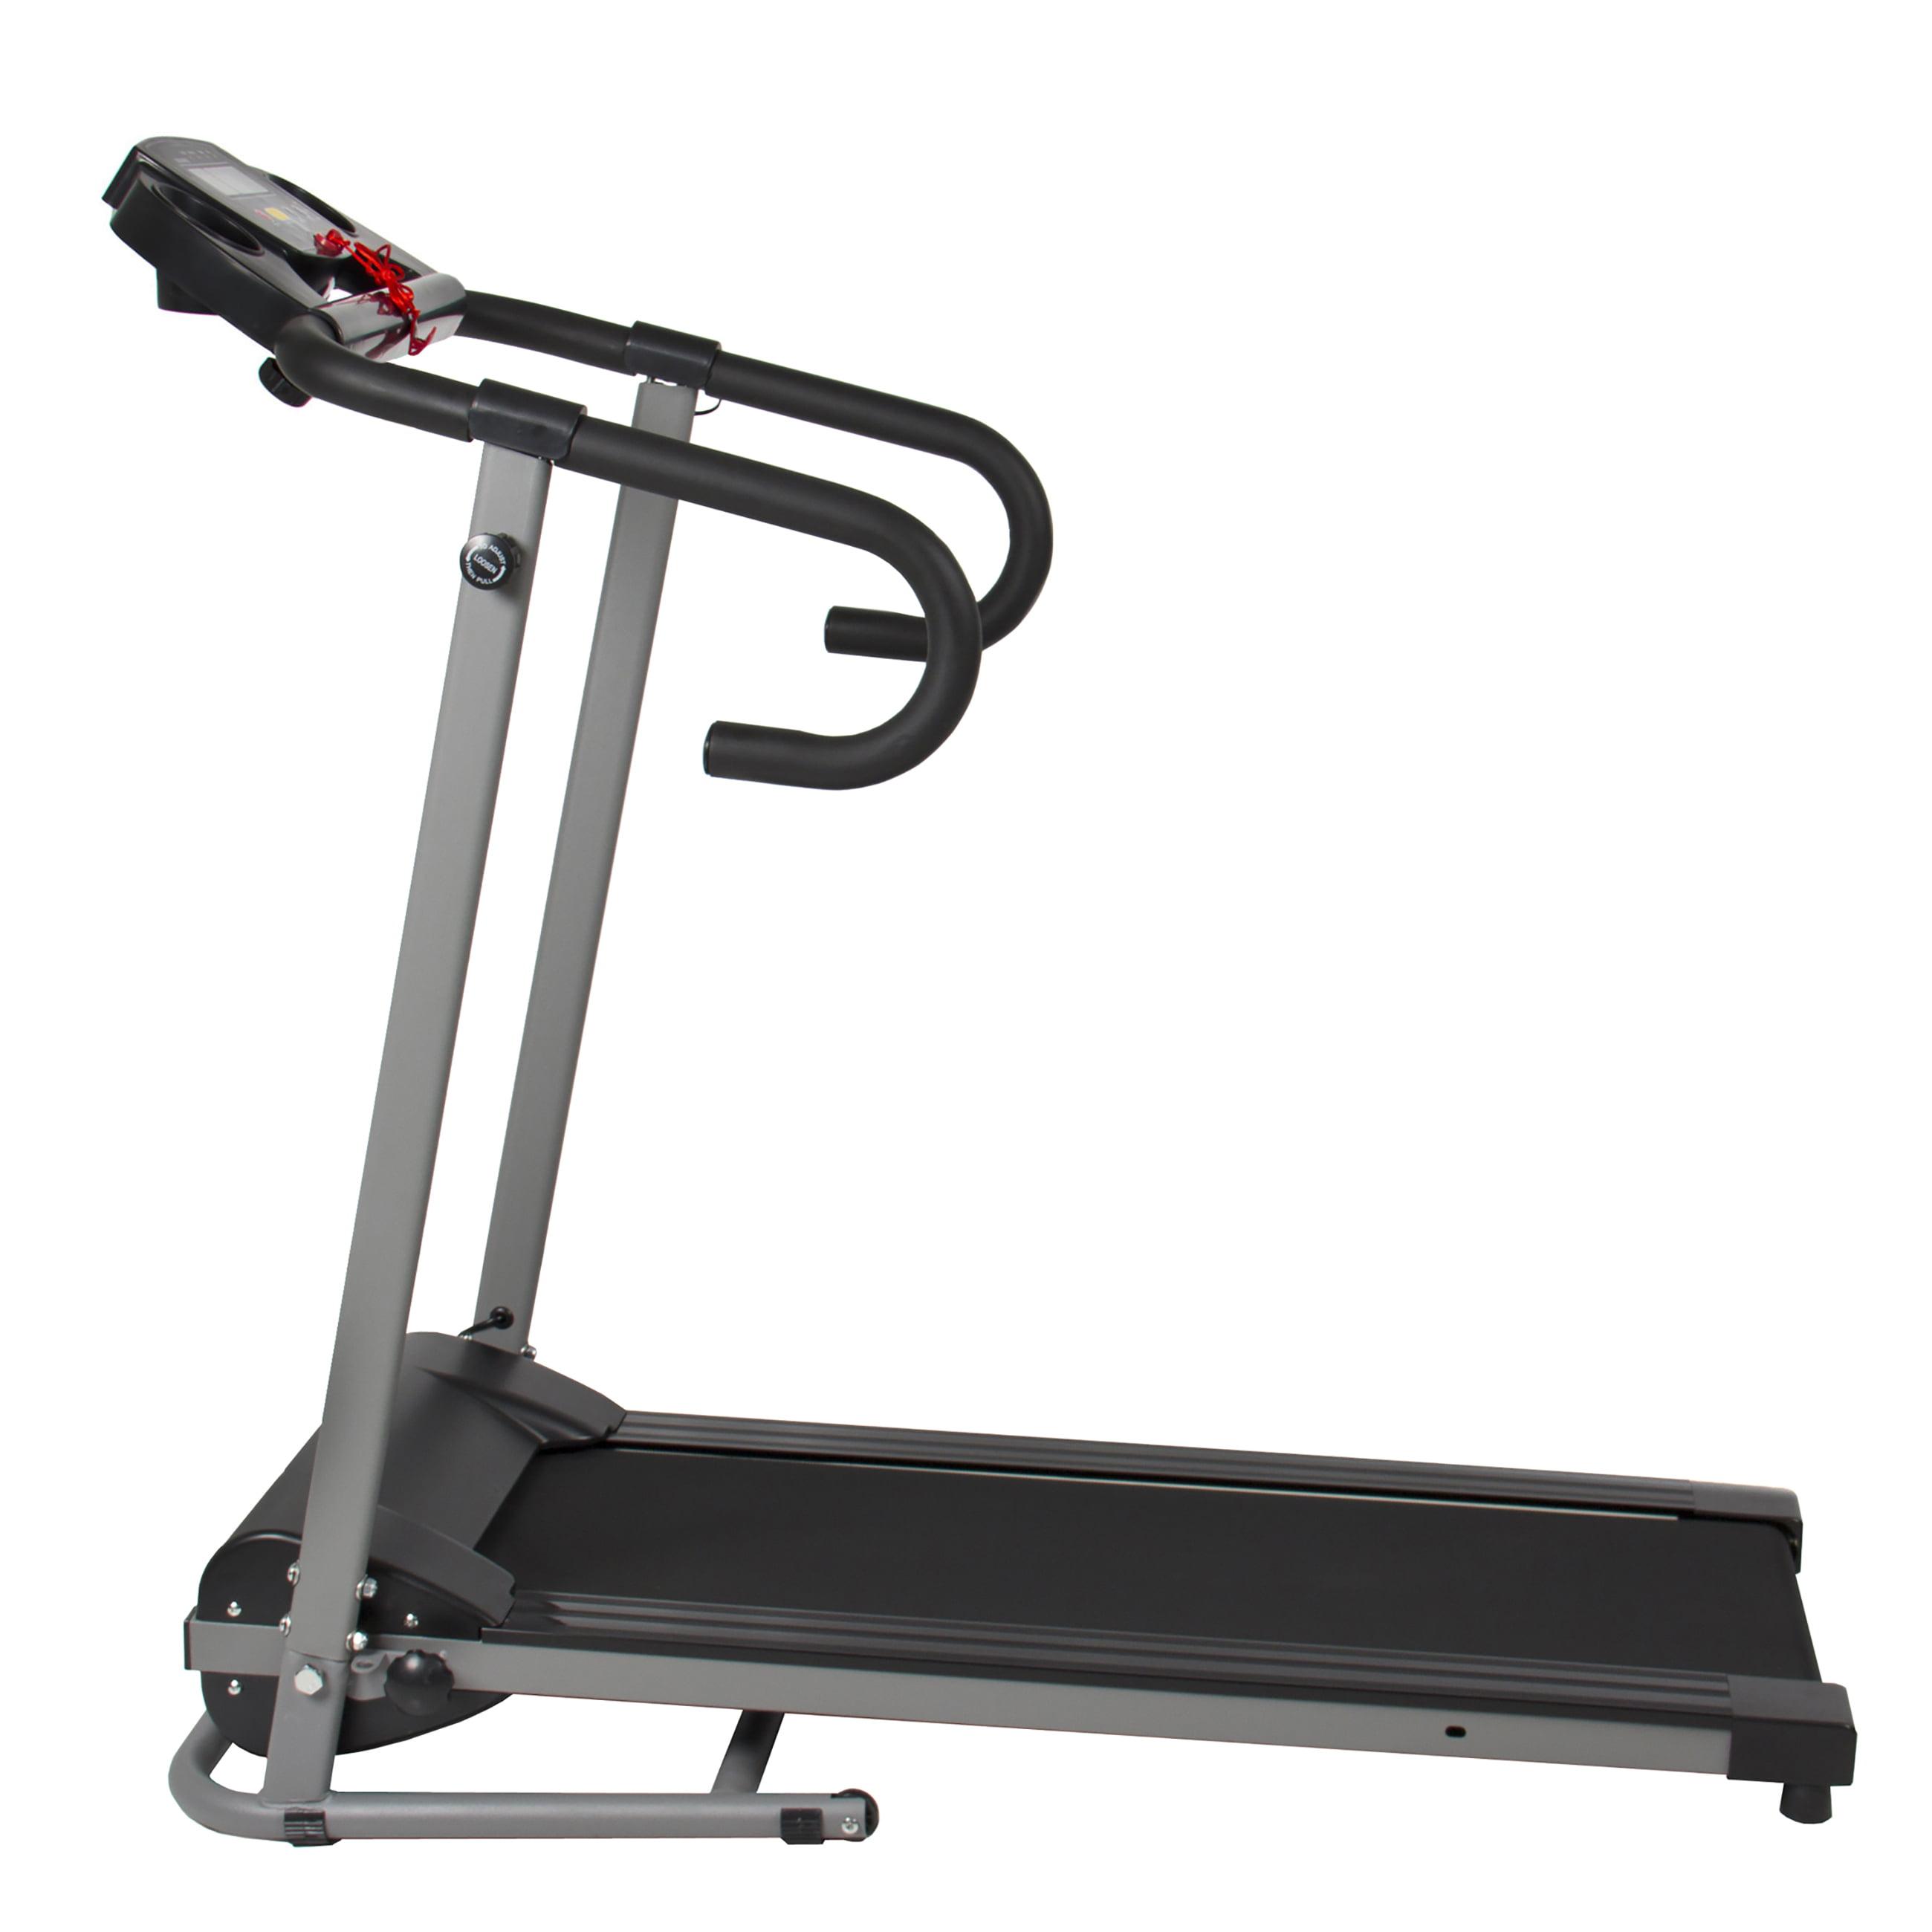 1100w Folding Electric Treadmill Portable Motorized Running Fitness